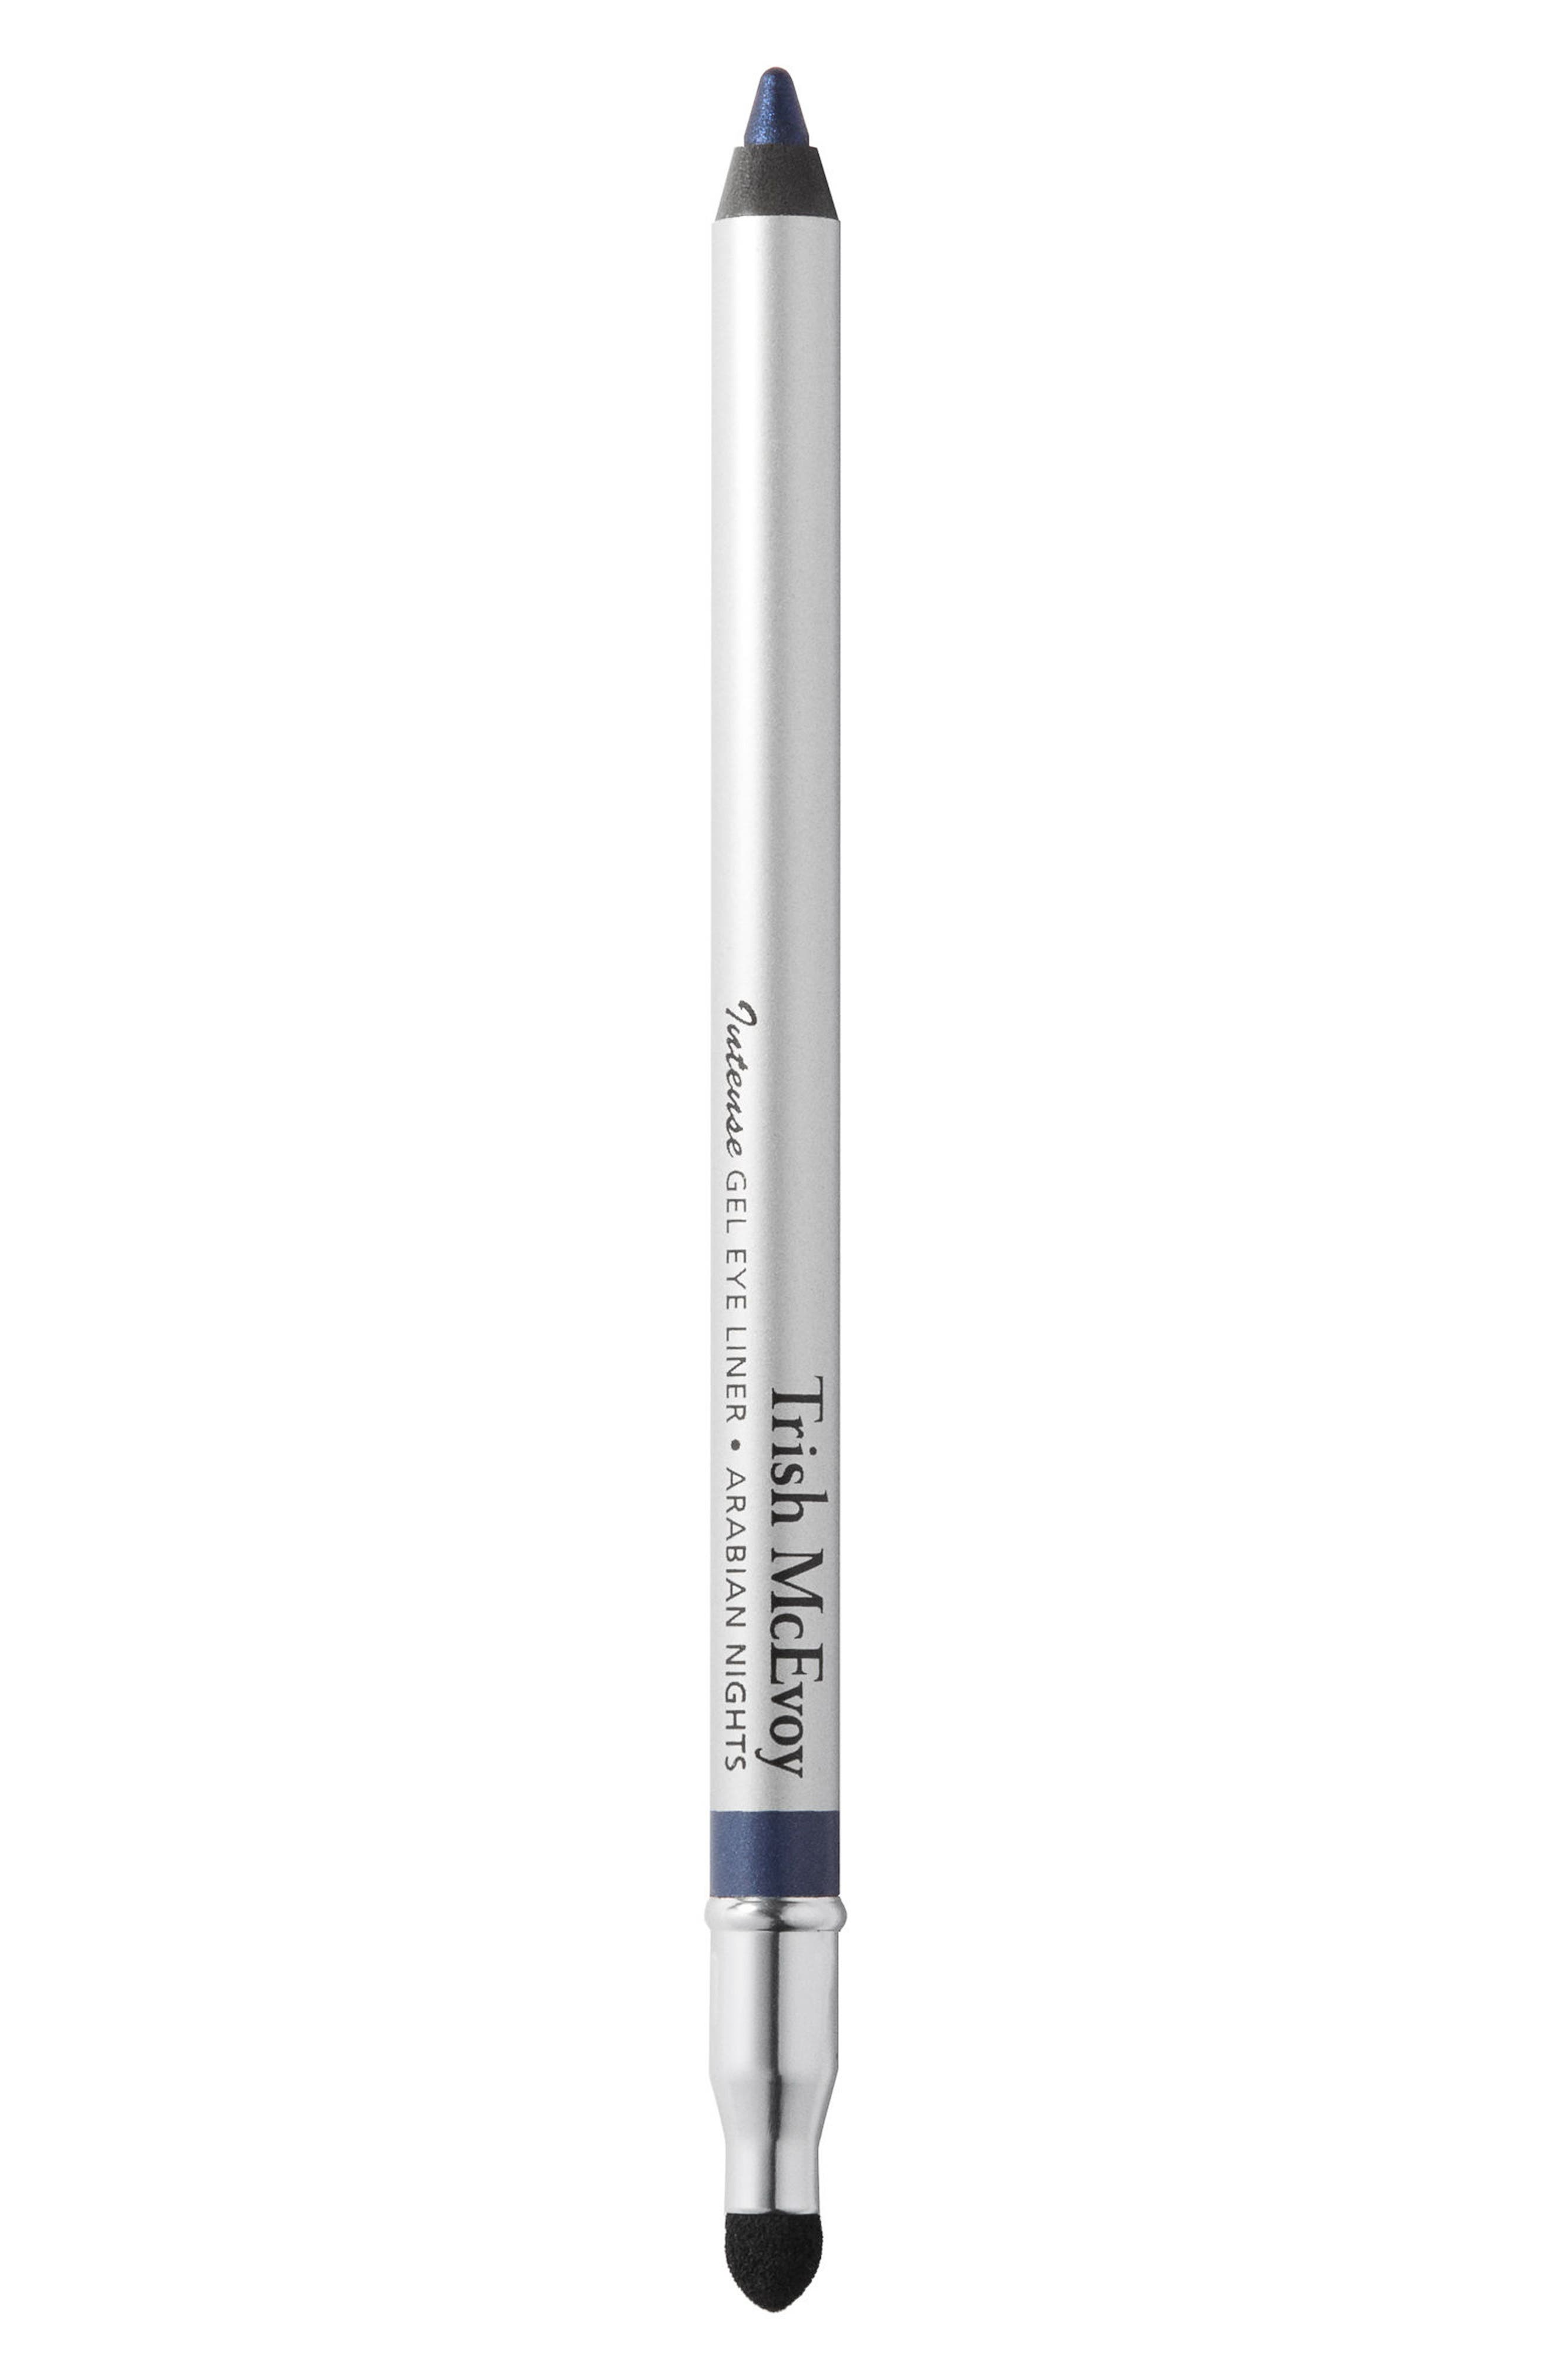 Alternate Image 1 Selected - Trish McEvoy 'Intense' Gel Eyeliner Pencil